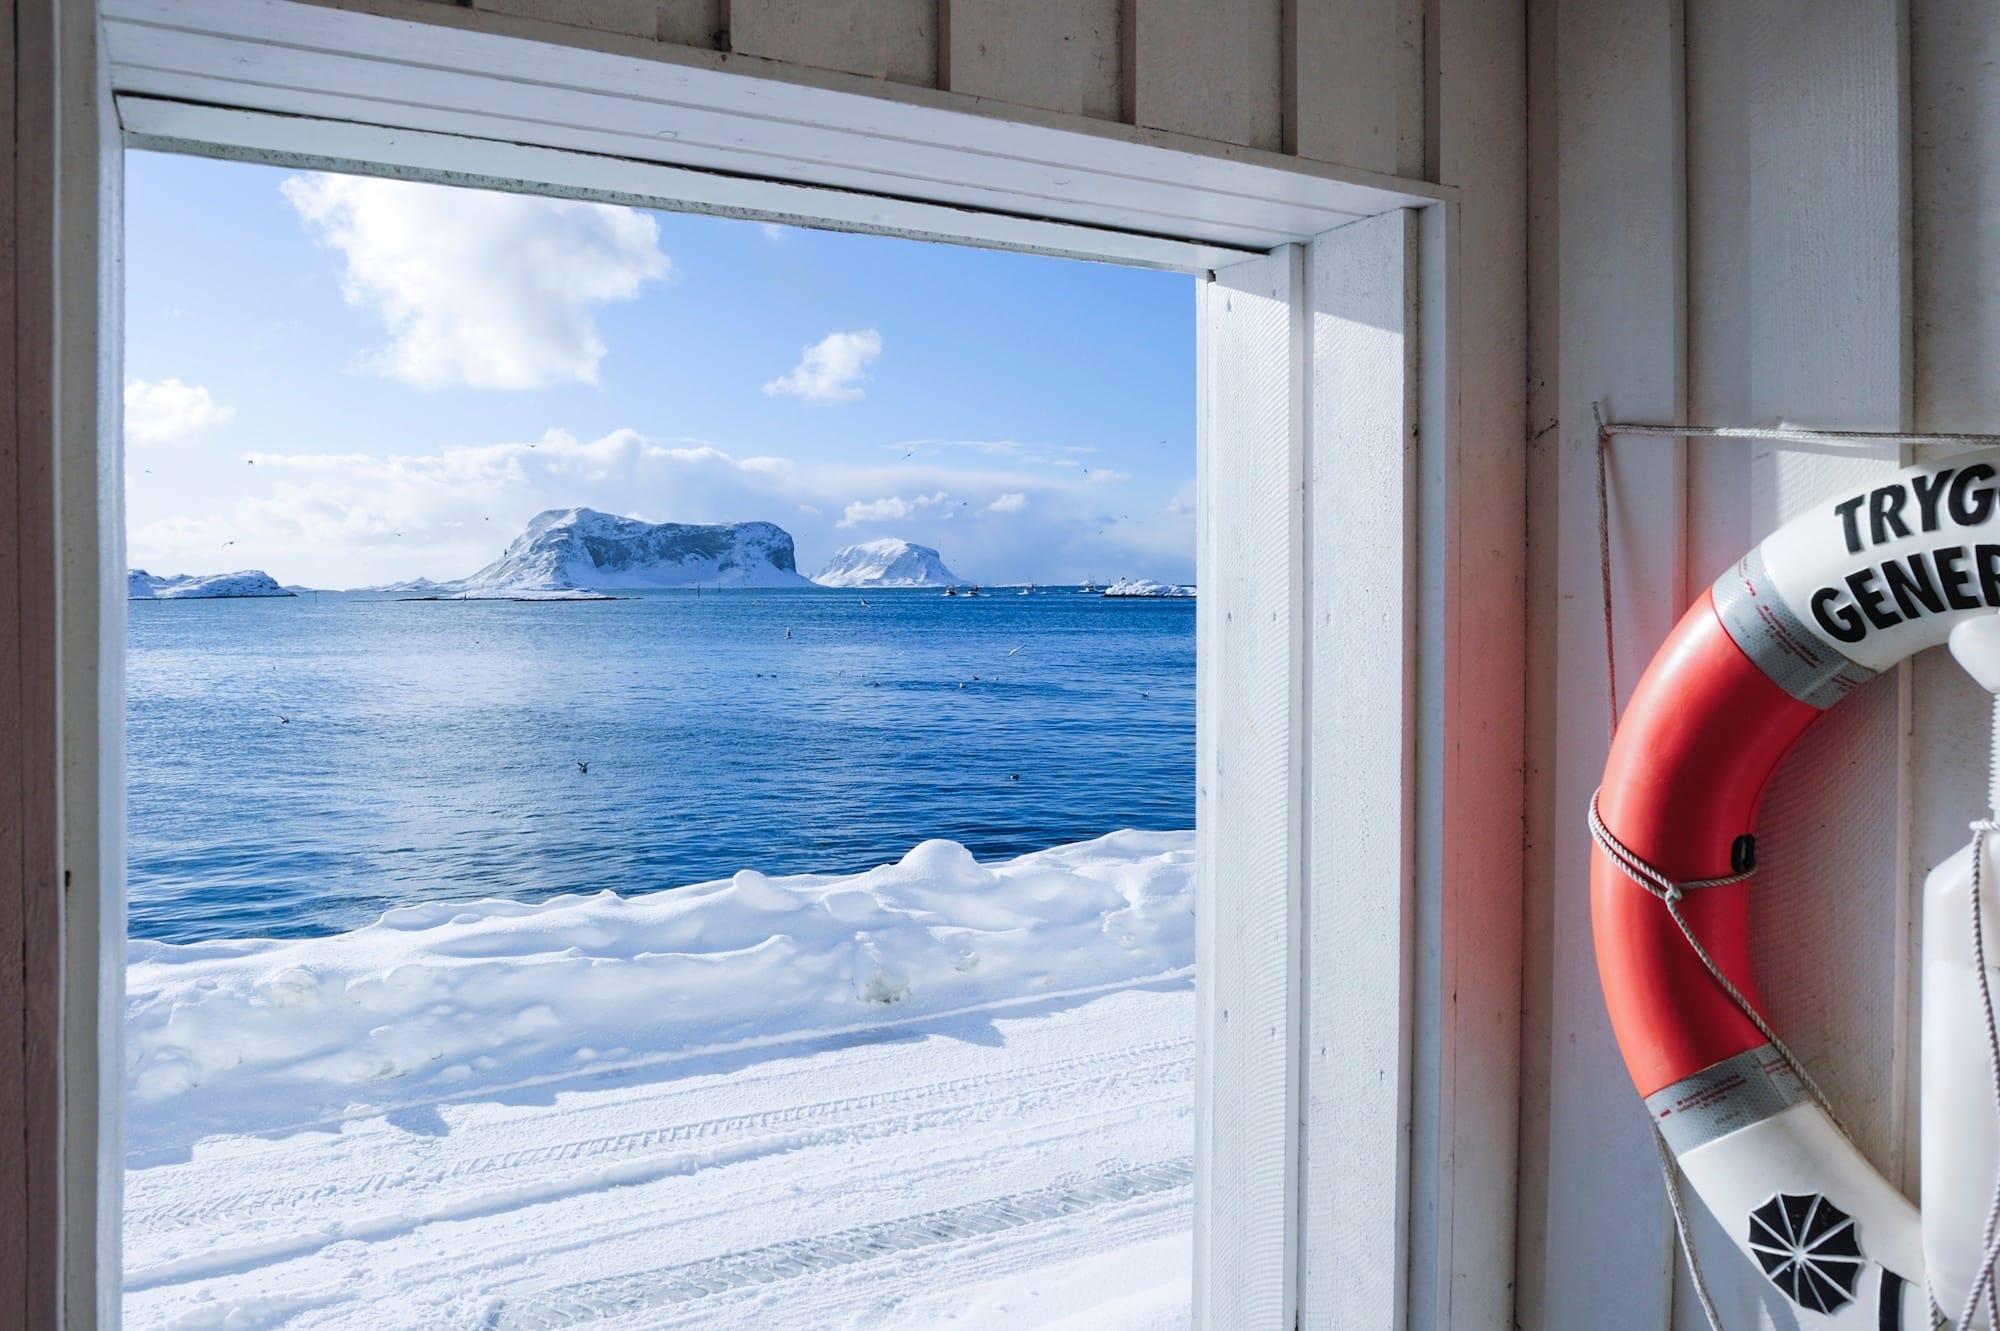 Johan Wildhagen – Sjømatrådet